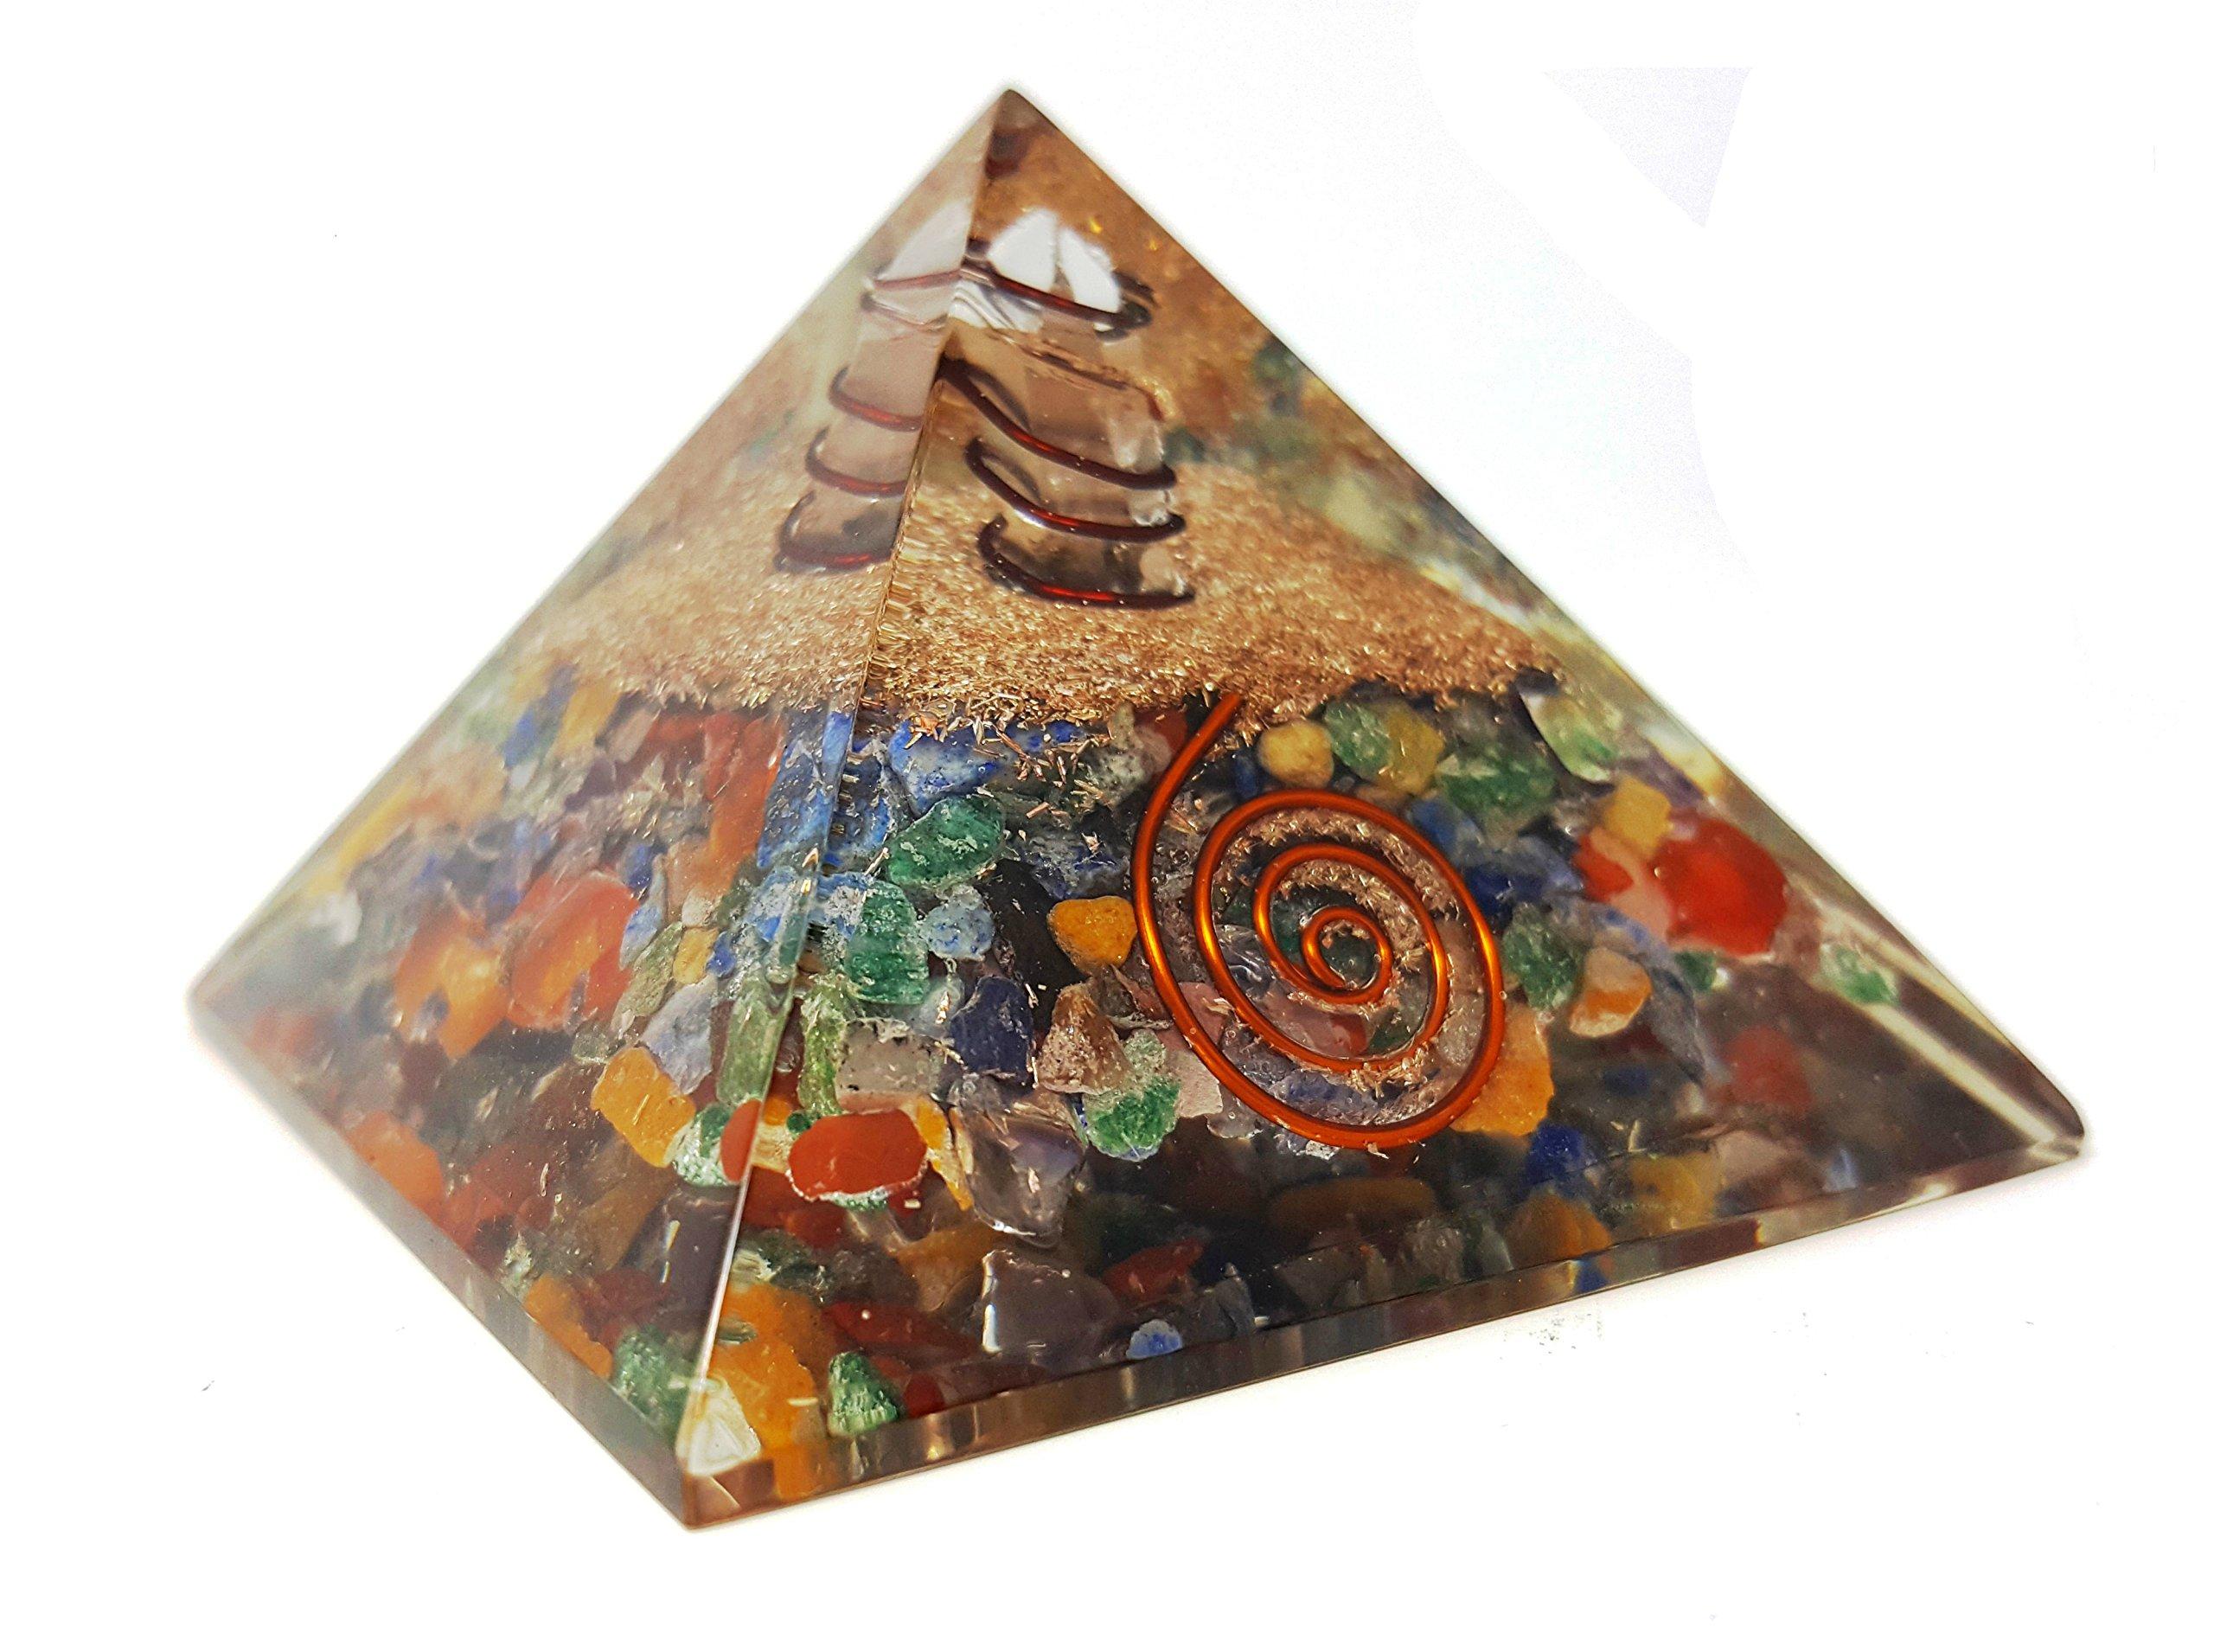 7 Chakra Crystal Orgone Pyramid Kit/Includes 4 Crystal Quartz Energy Points/EMF Protection Meditation Yoga Energy Generator by Auramore (Image #2)